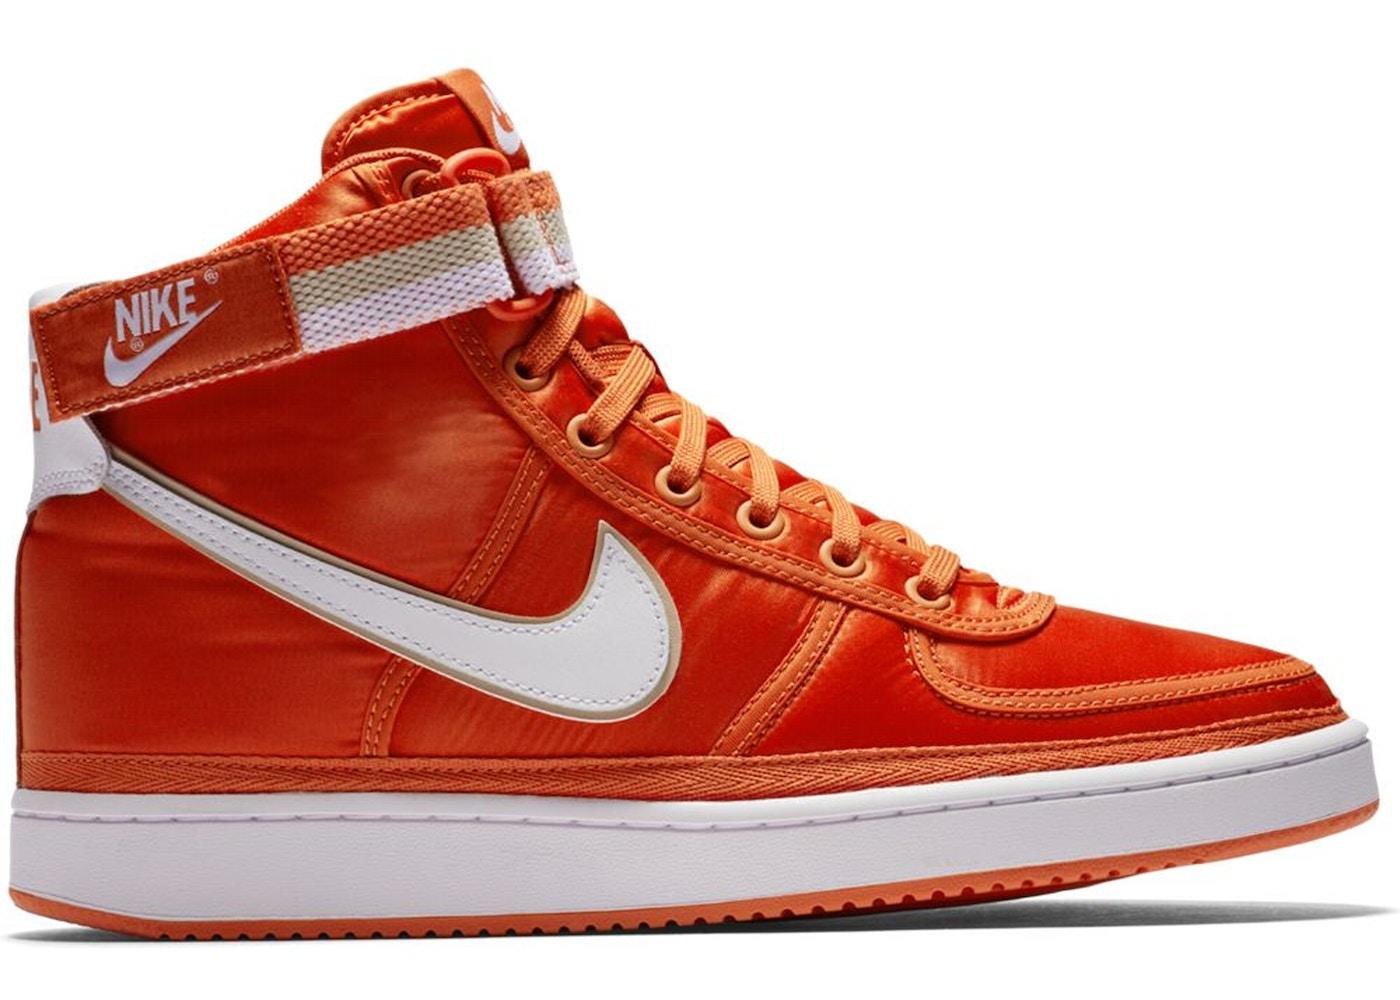 23abcbebb352d1 Nike Vandal High Supreme Vintage Coral - 318330-800